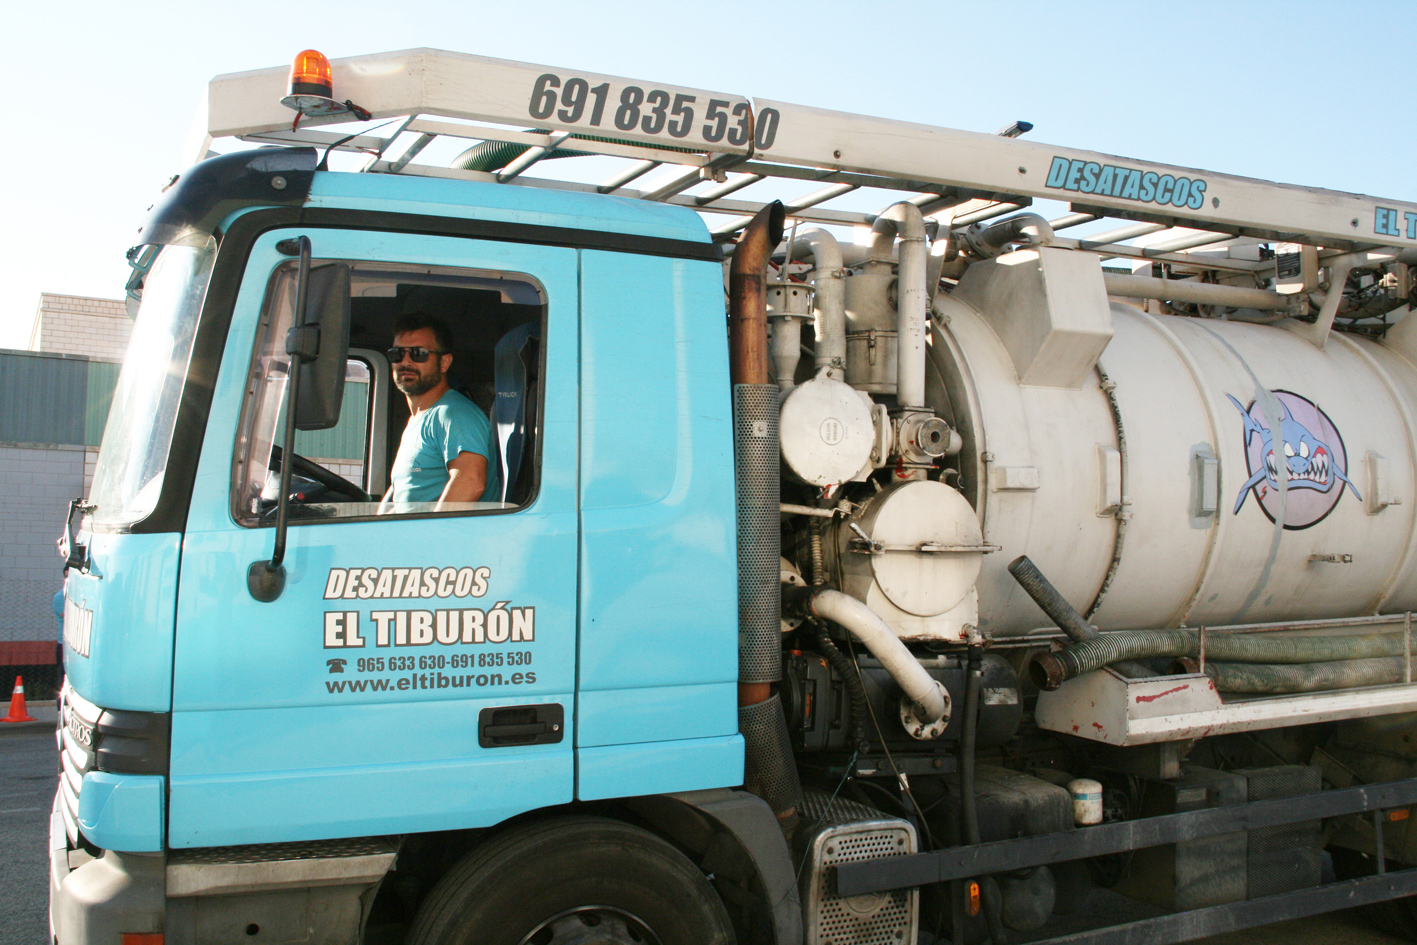 Urgent industrial cleaning services.  We move to a Benidorm, Villajoyosa, Javea, Calpe, Santa Pola, Elche, Arenales del Sol